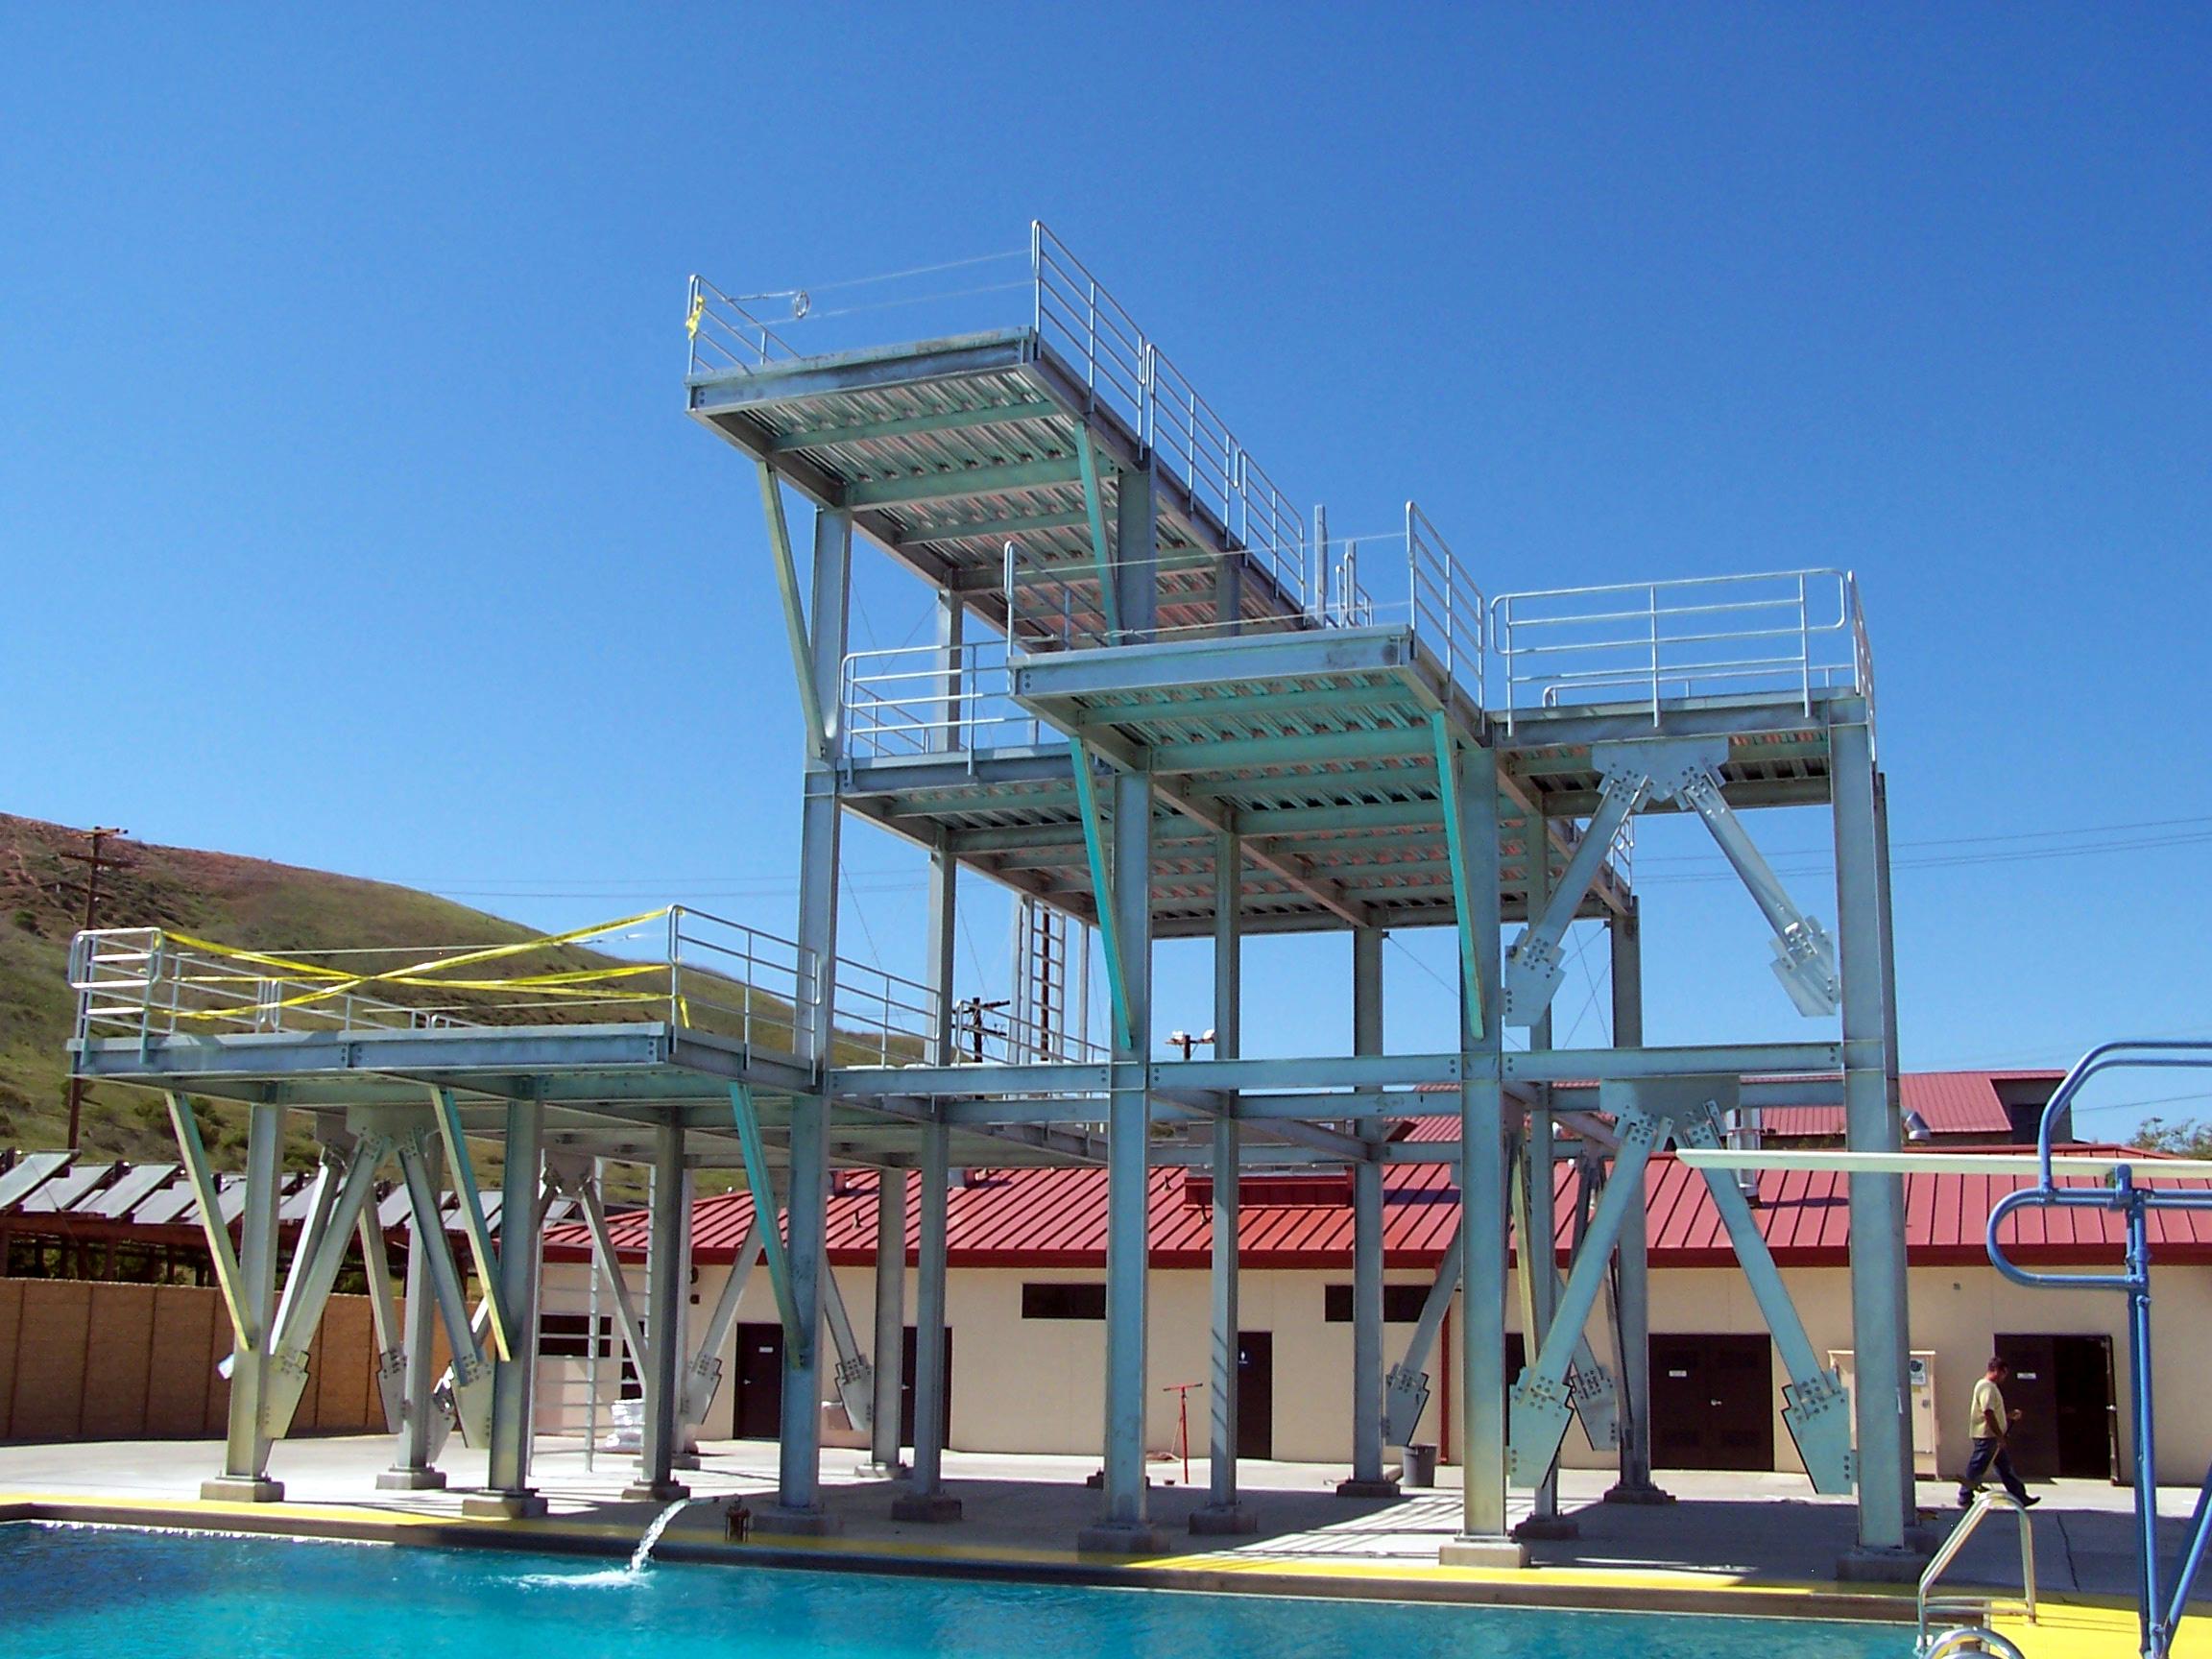 Dive Tank Platform, Camp Pendleton, CA